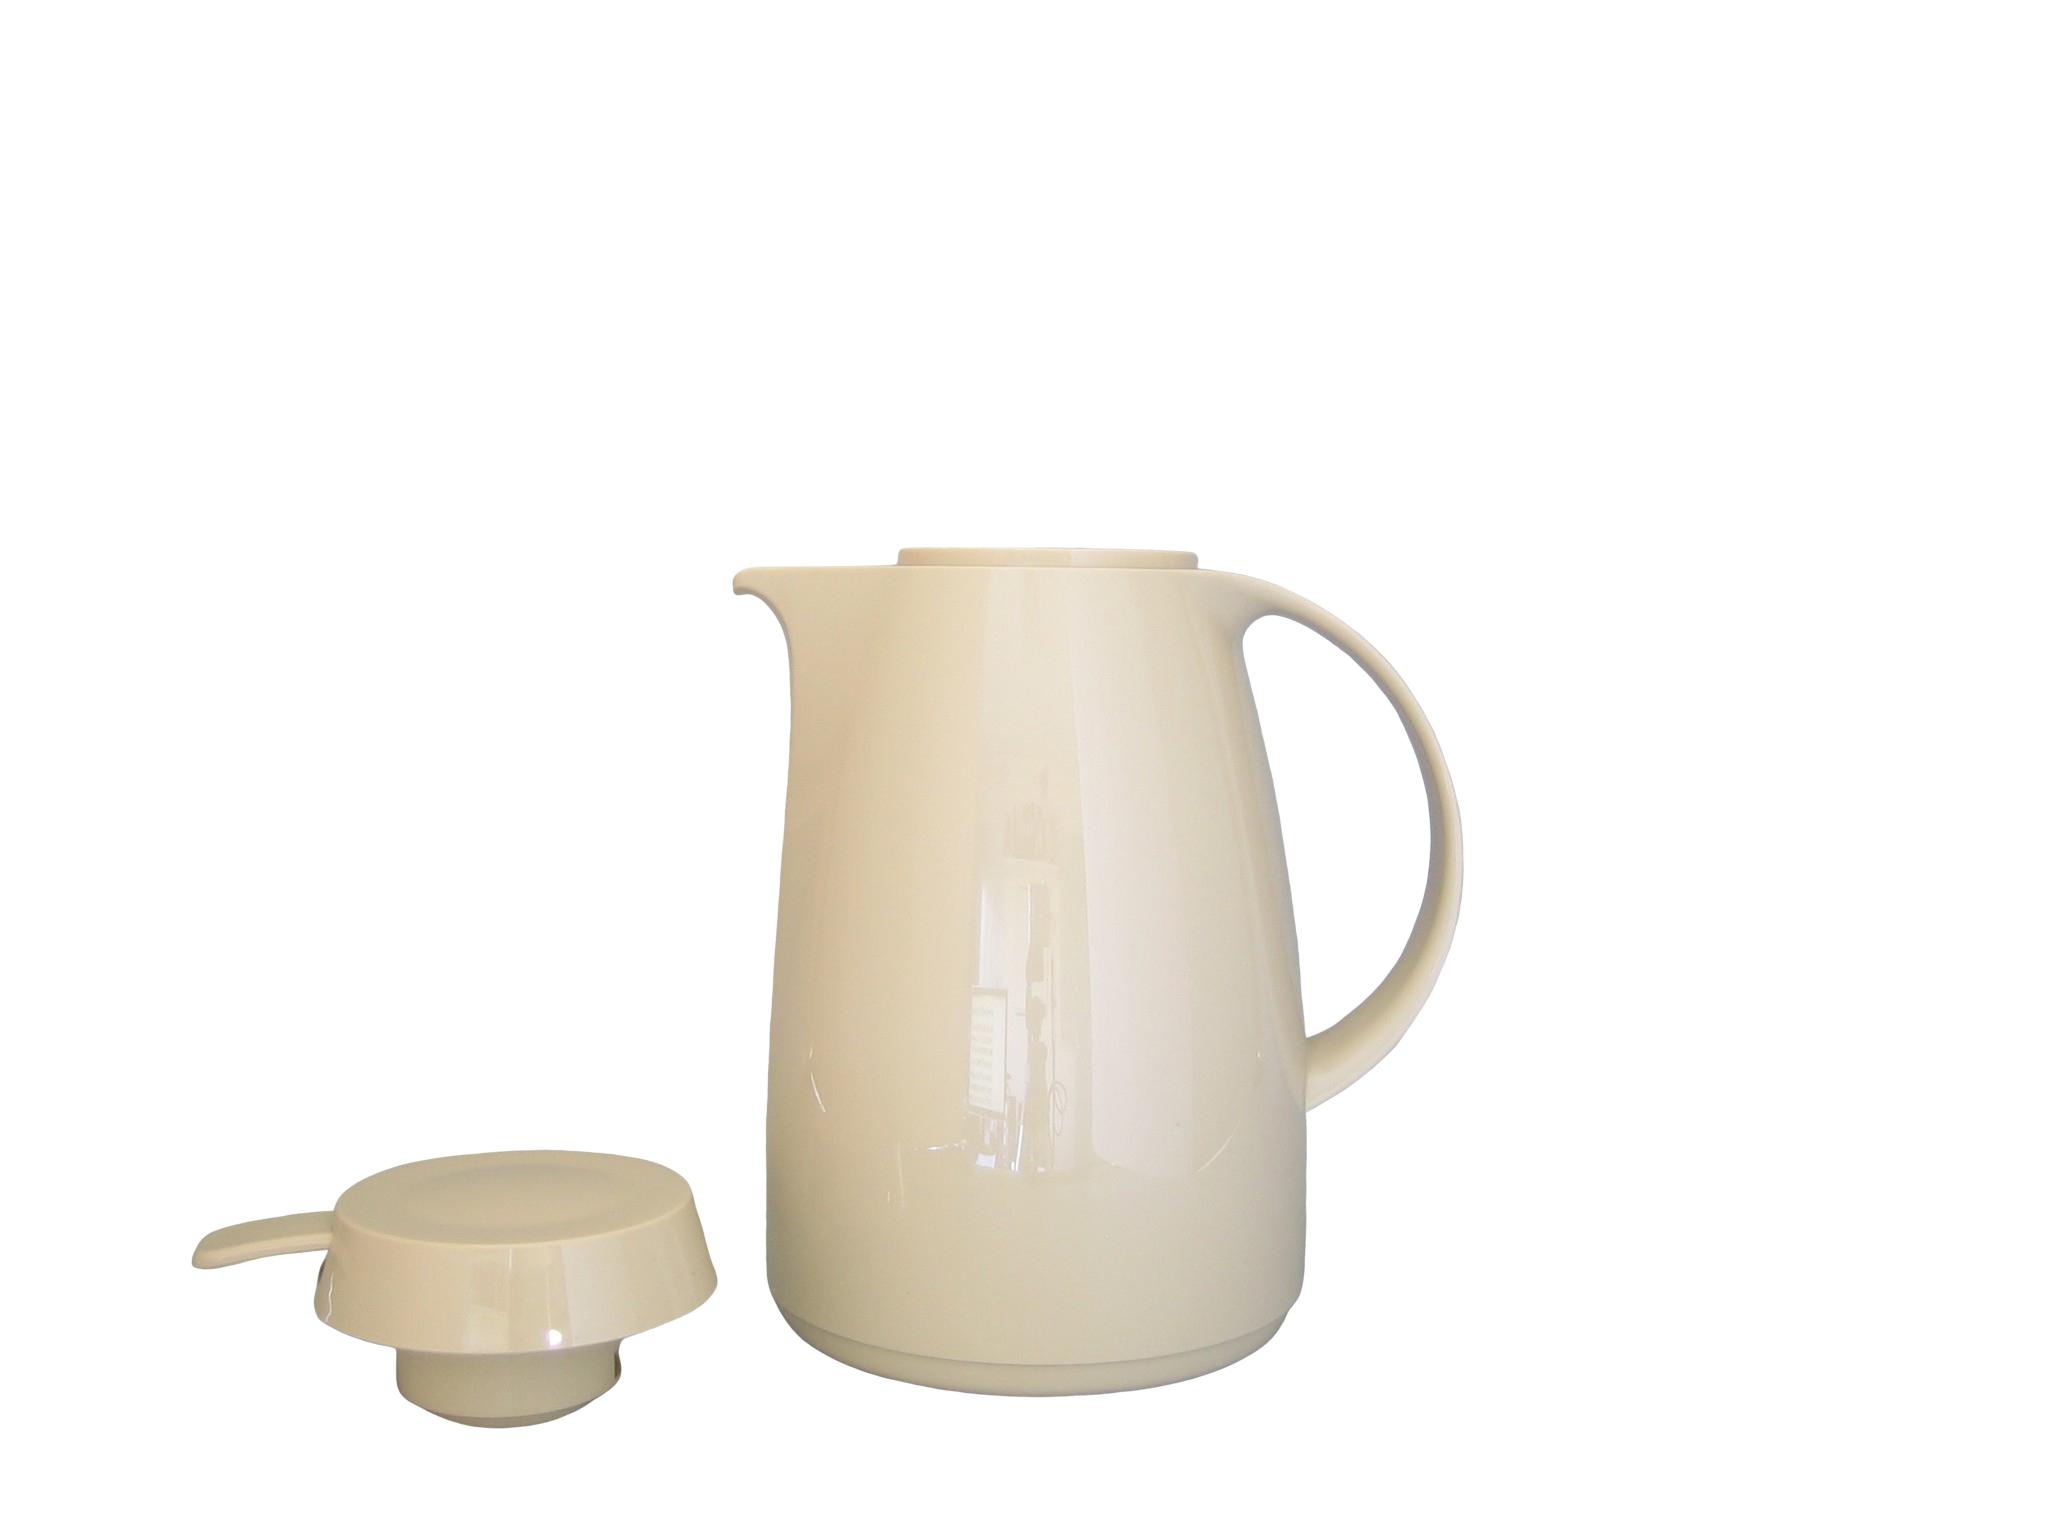 7204-042 - Vacuum carafe beige 1.0 L SERVITHERM - Helios